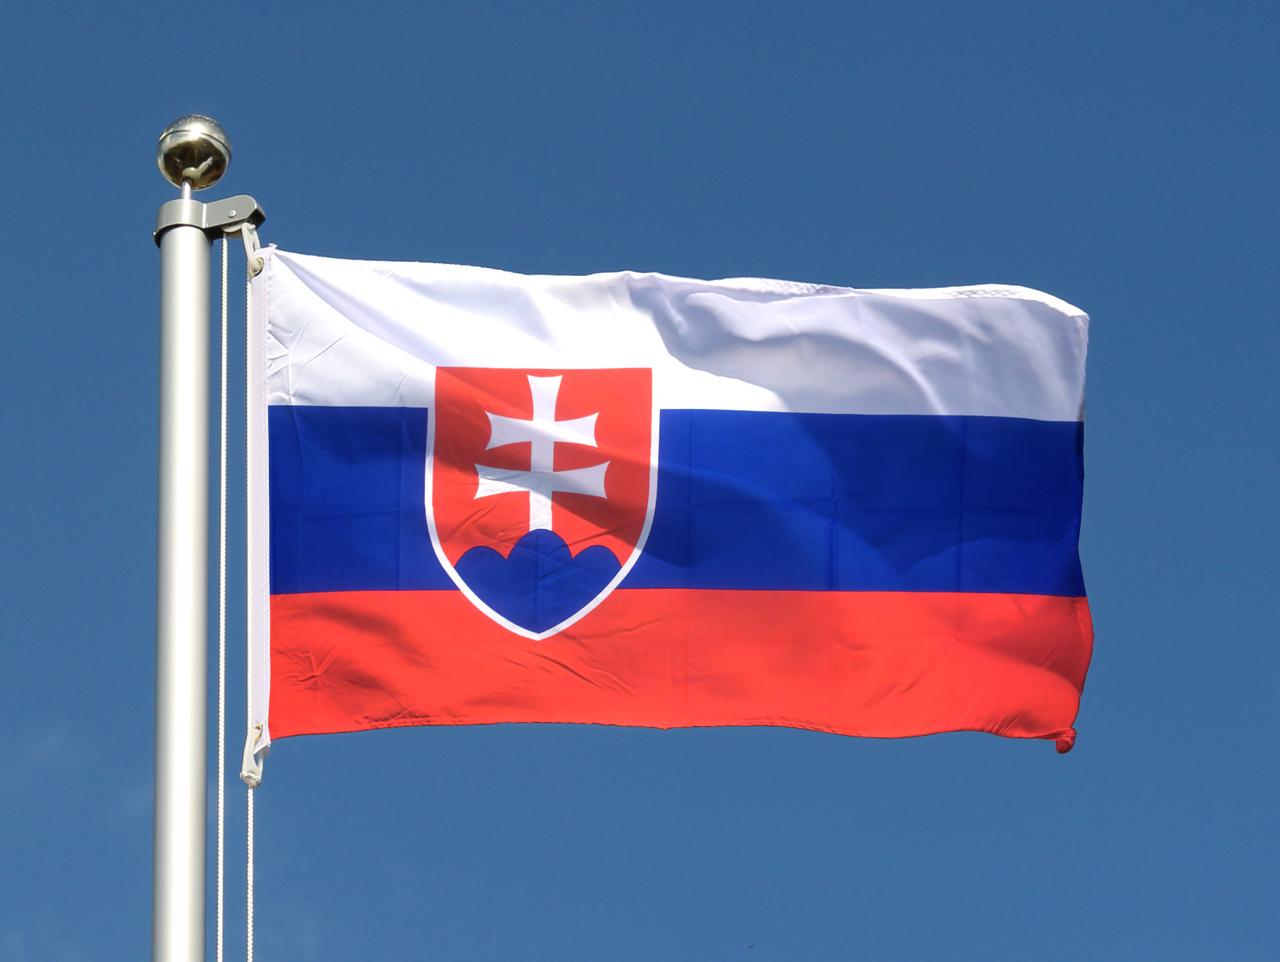 Drapeau//drapeau slovaquie Hissflagge 150 x 250 CM